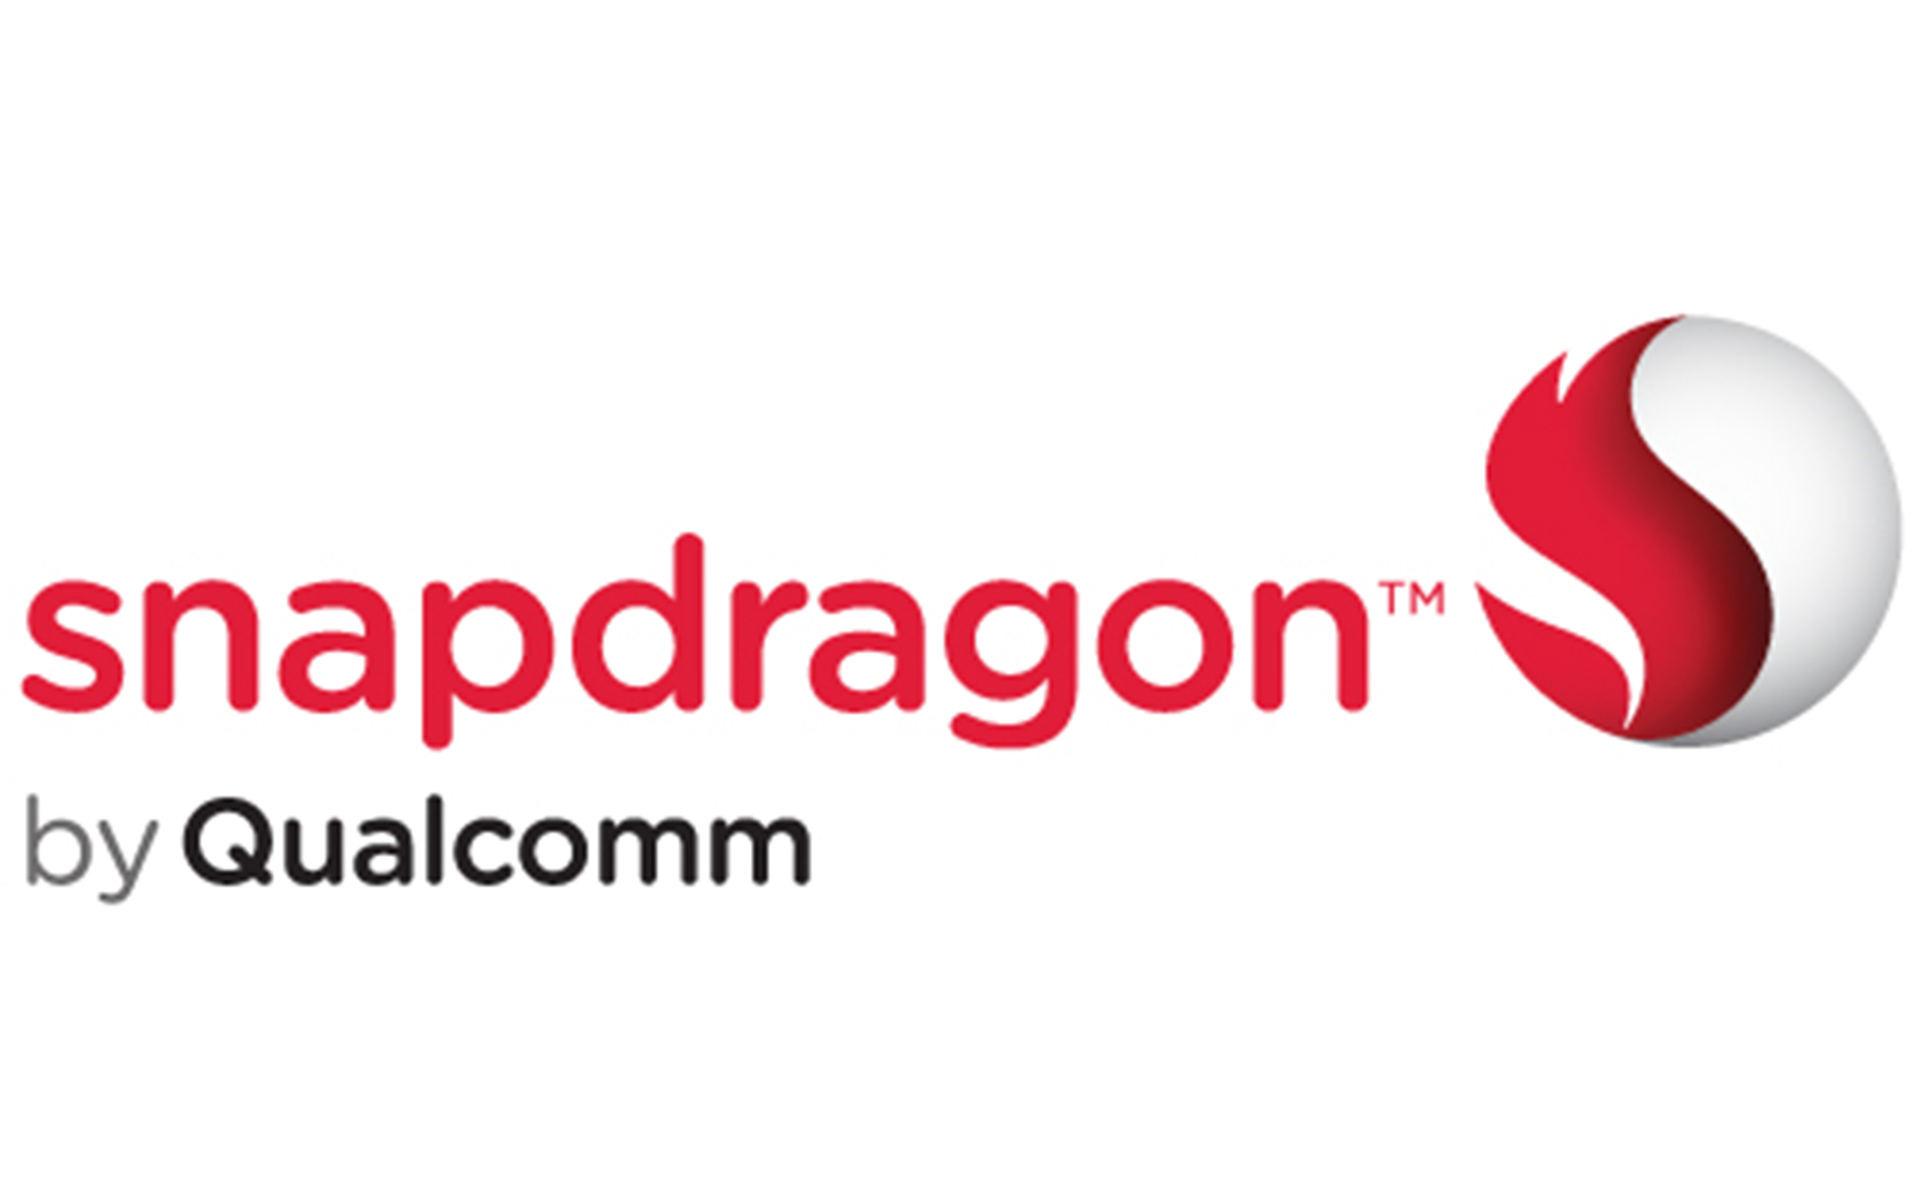 snapdragon-2919